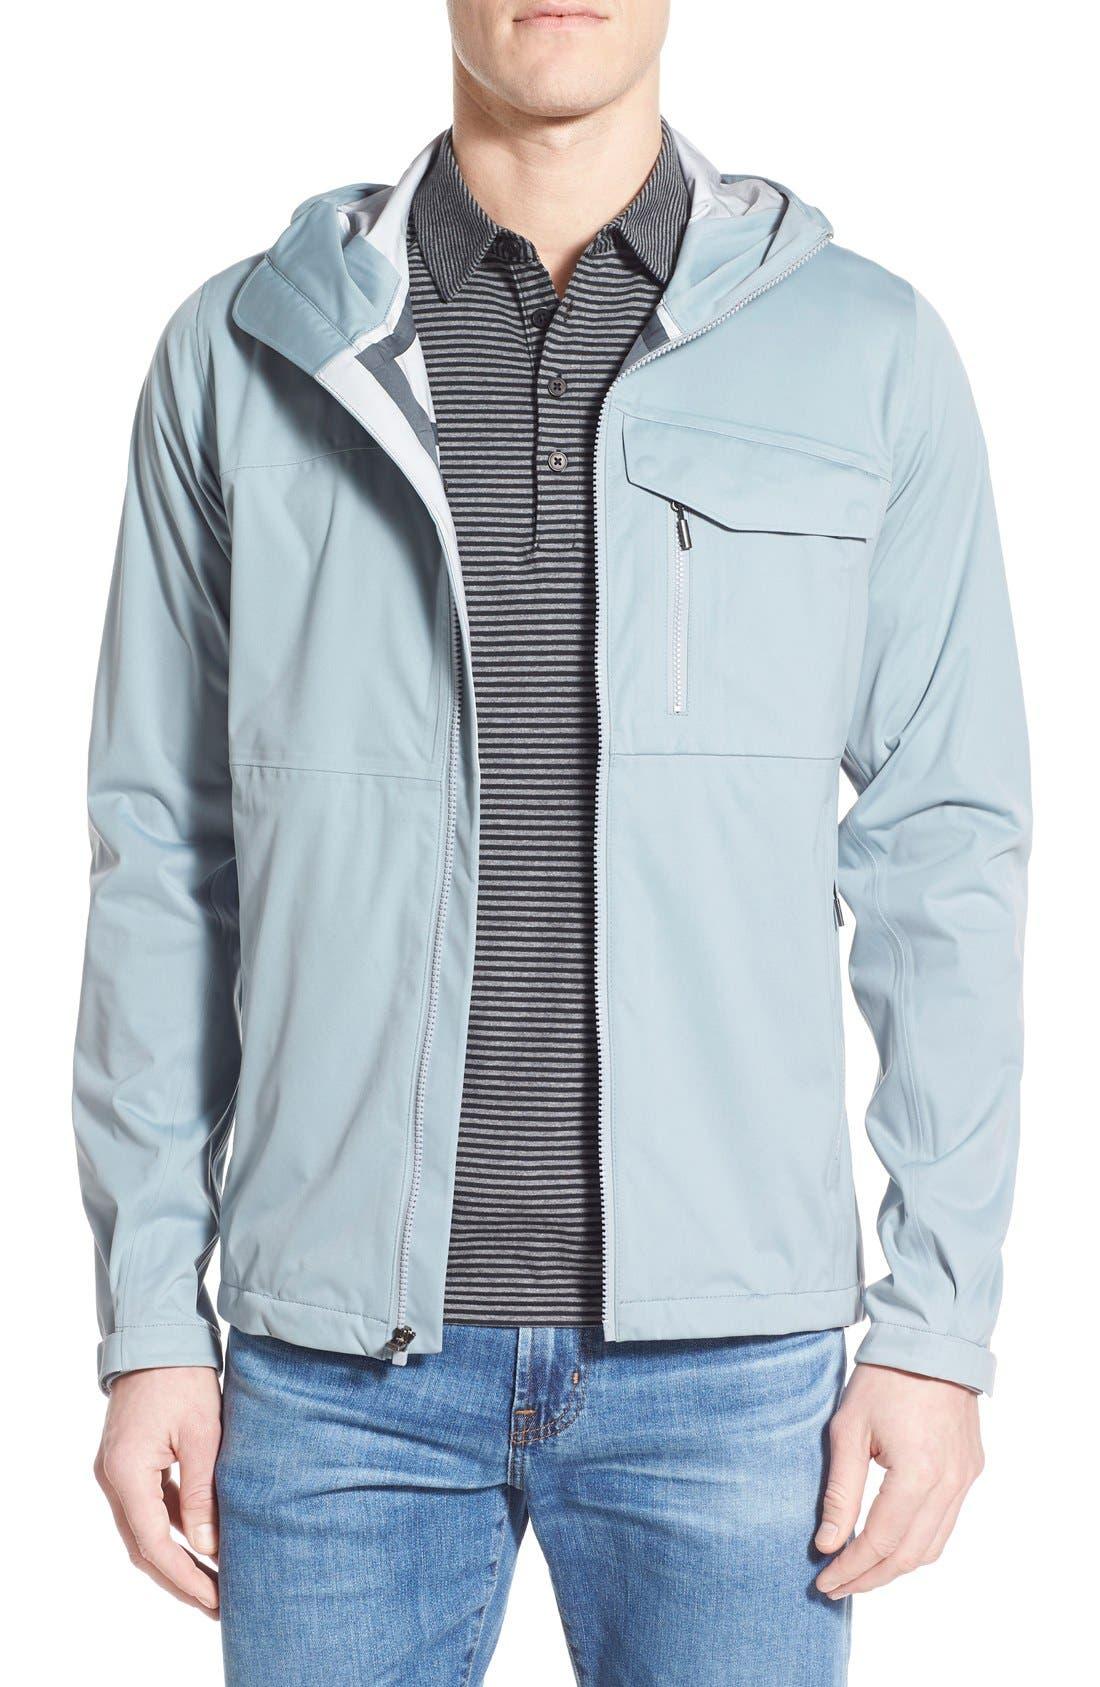 'Rebound' Regular Fit Zip Hooded Jacket,                             Main thumbnail 1, color,                             073